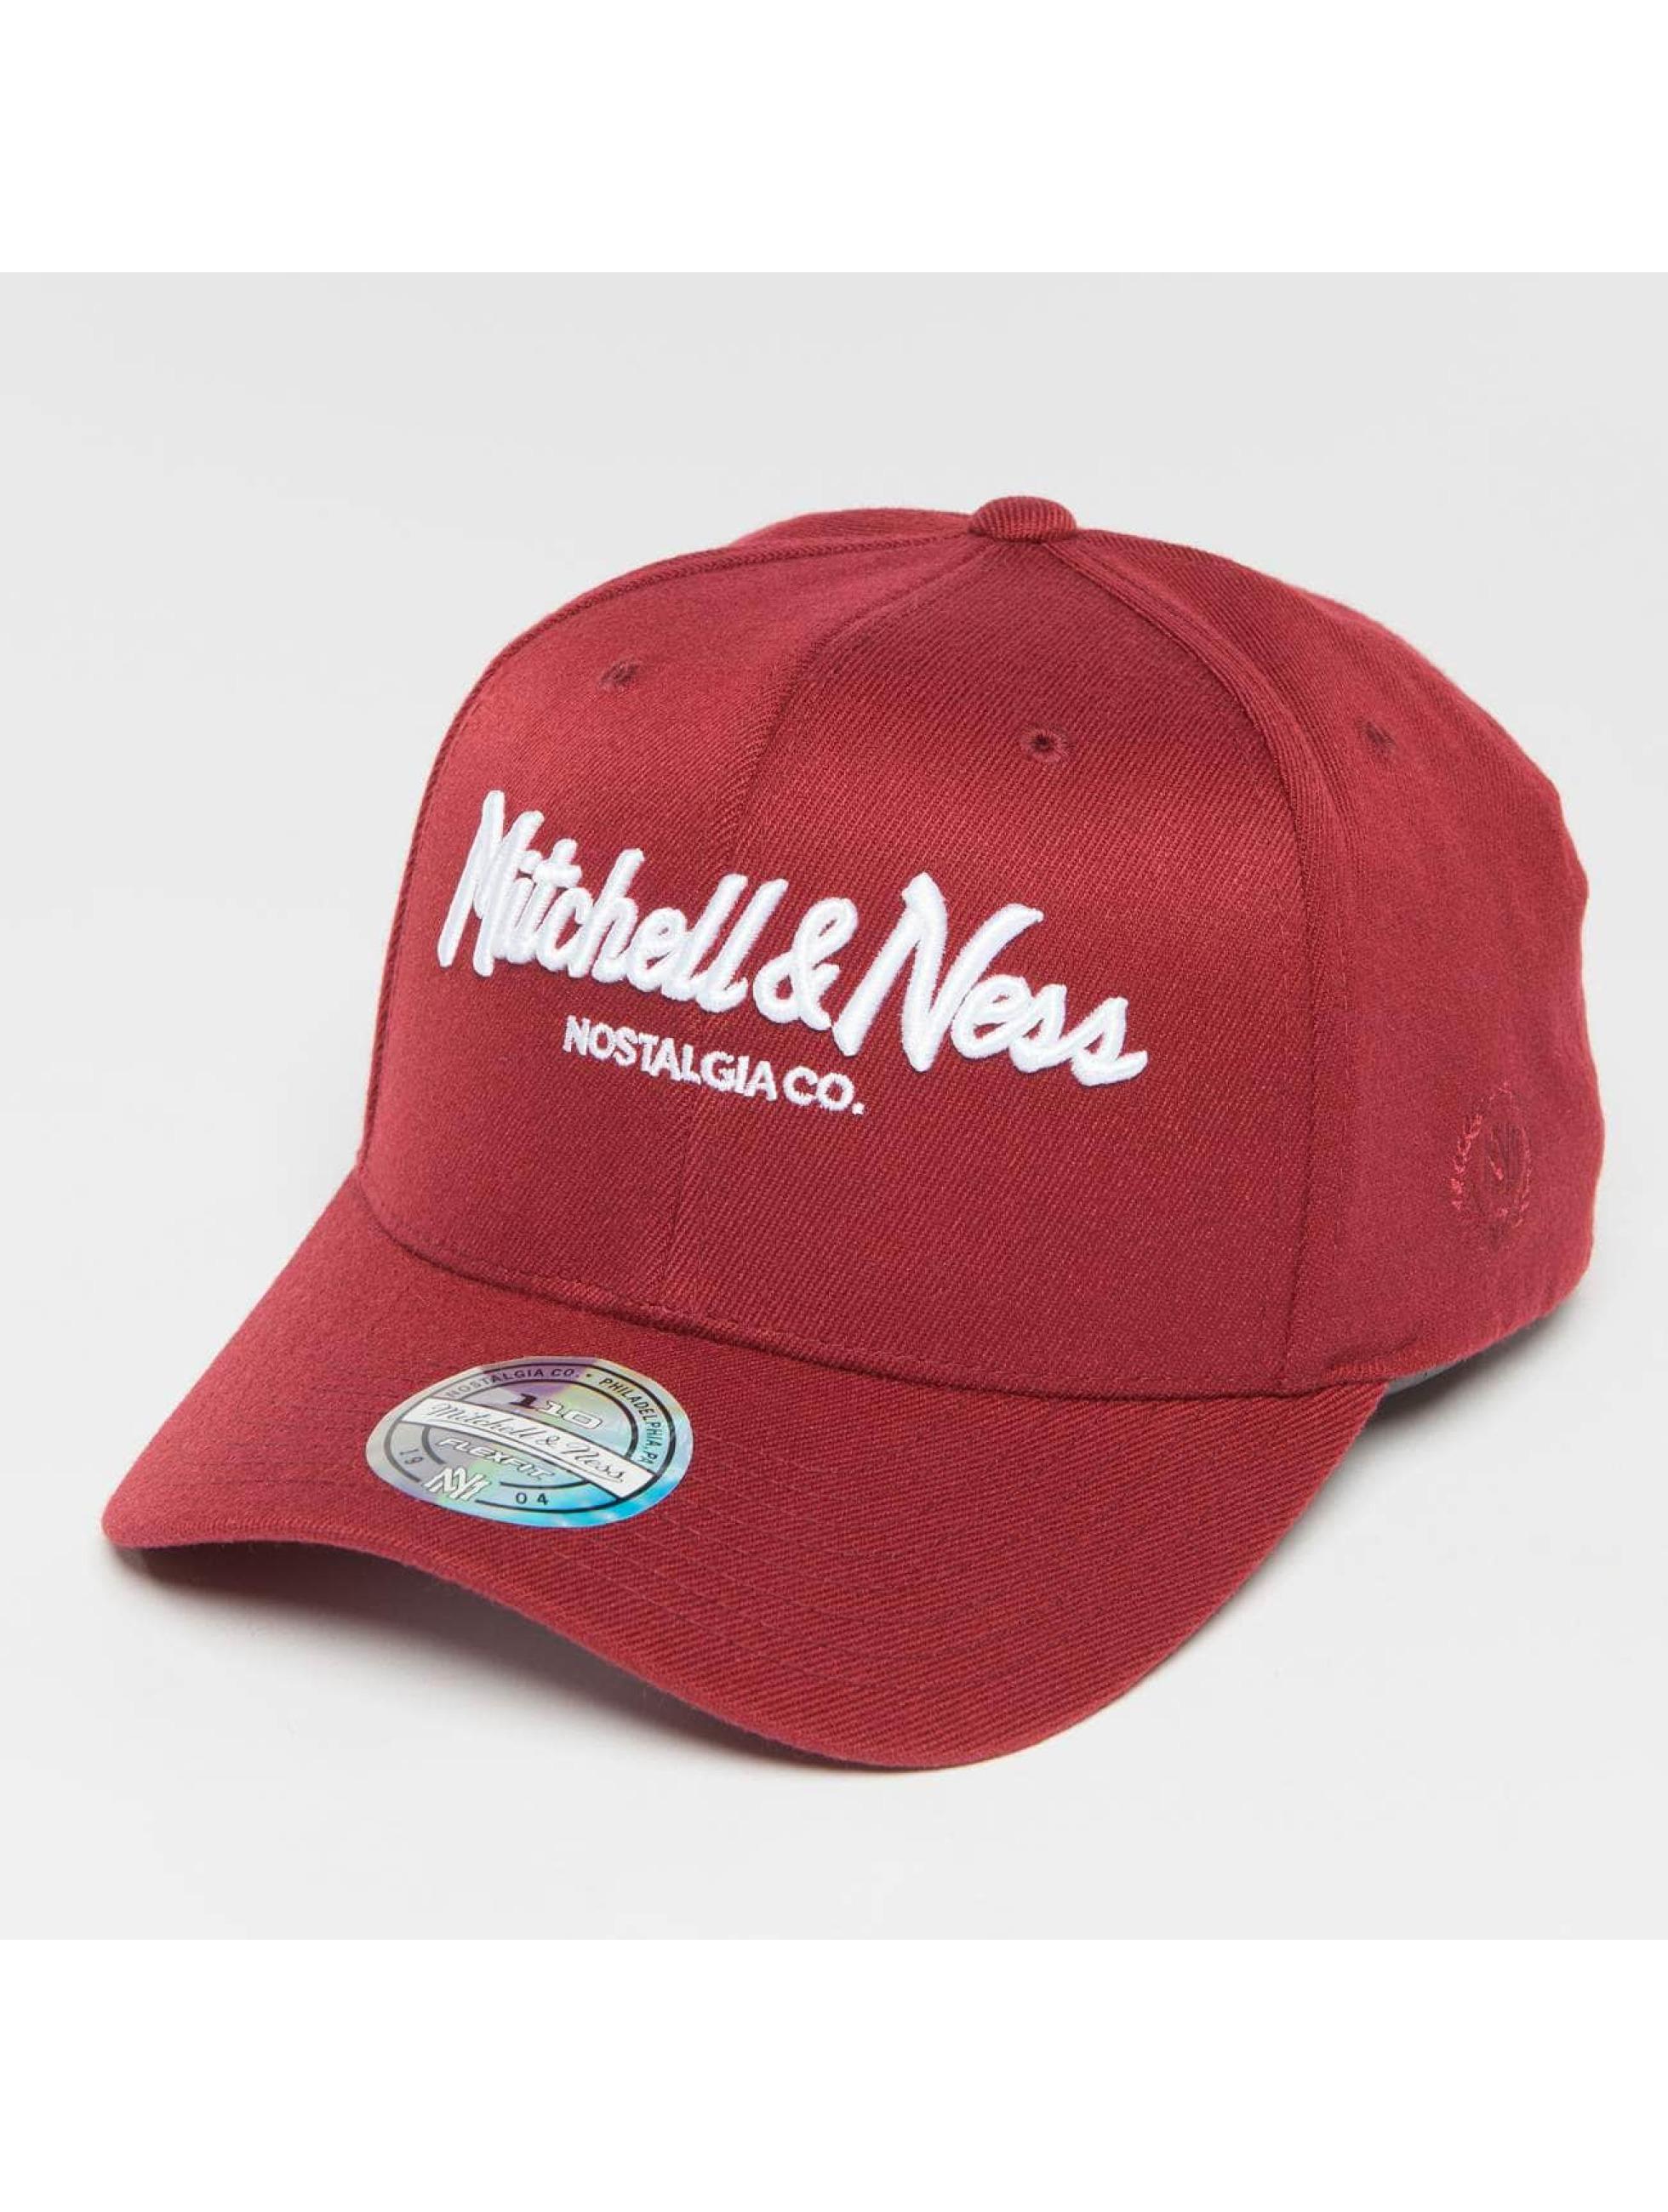 Mitchell & Ness Snapback Cap The Burgundy 2-Tone Pinscript 110 red